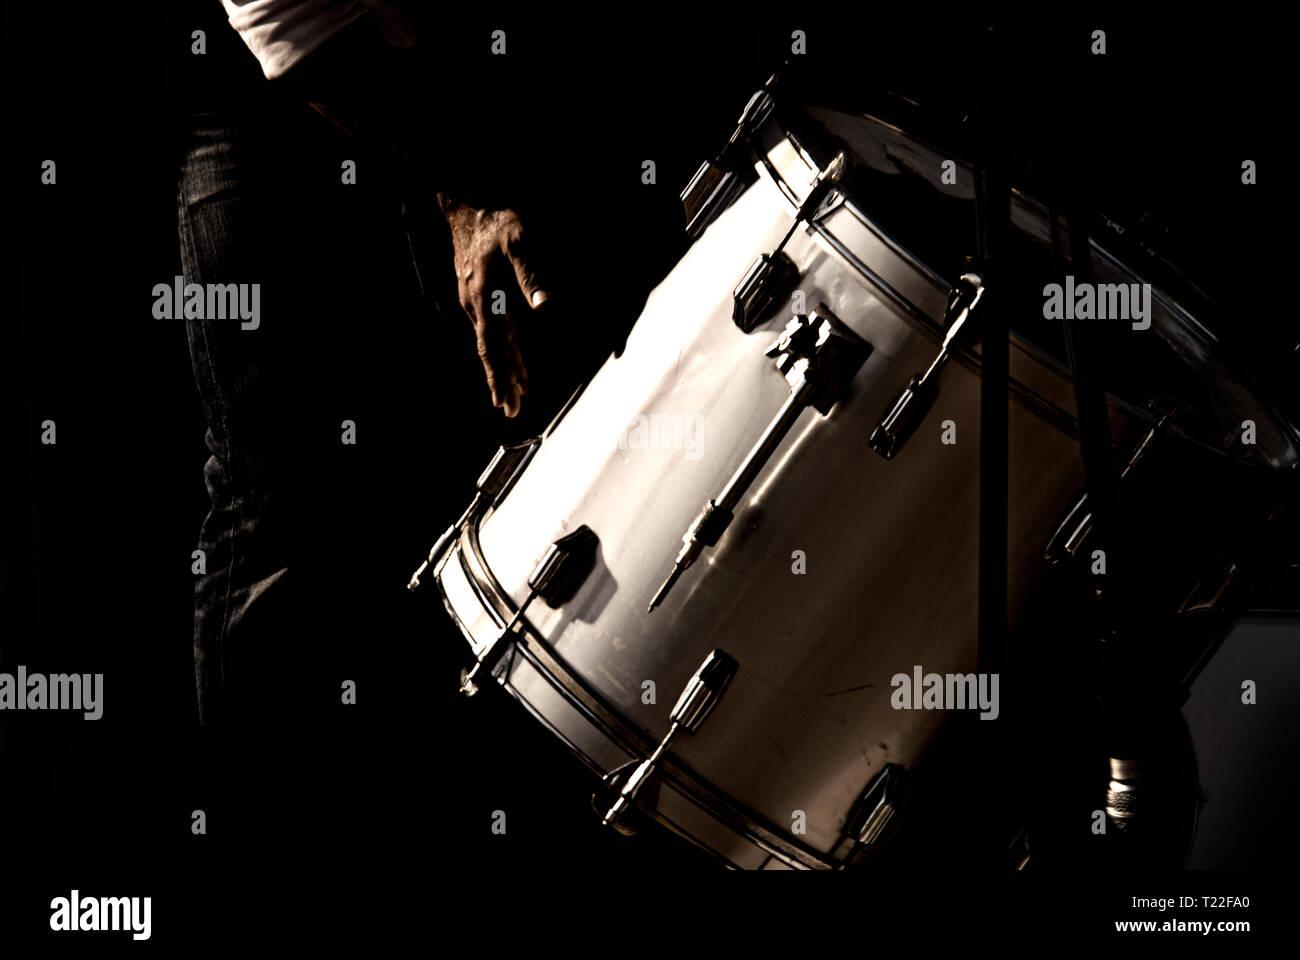 Drummer - Stock Image